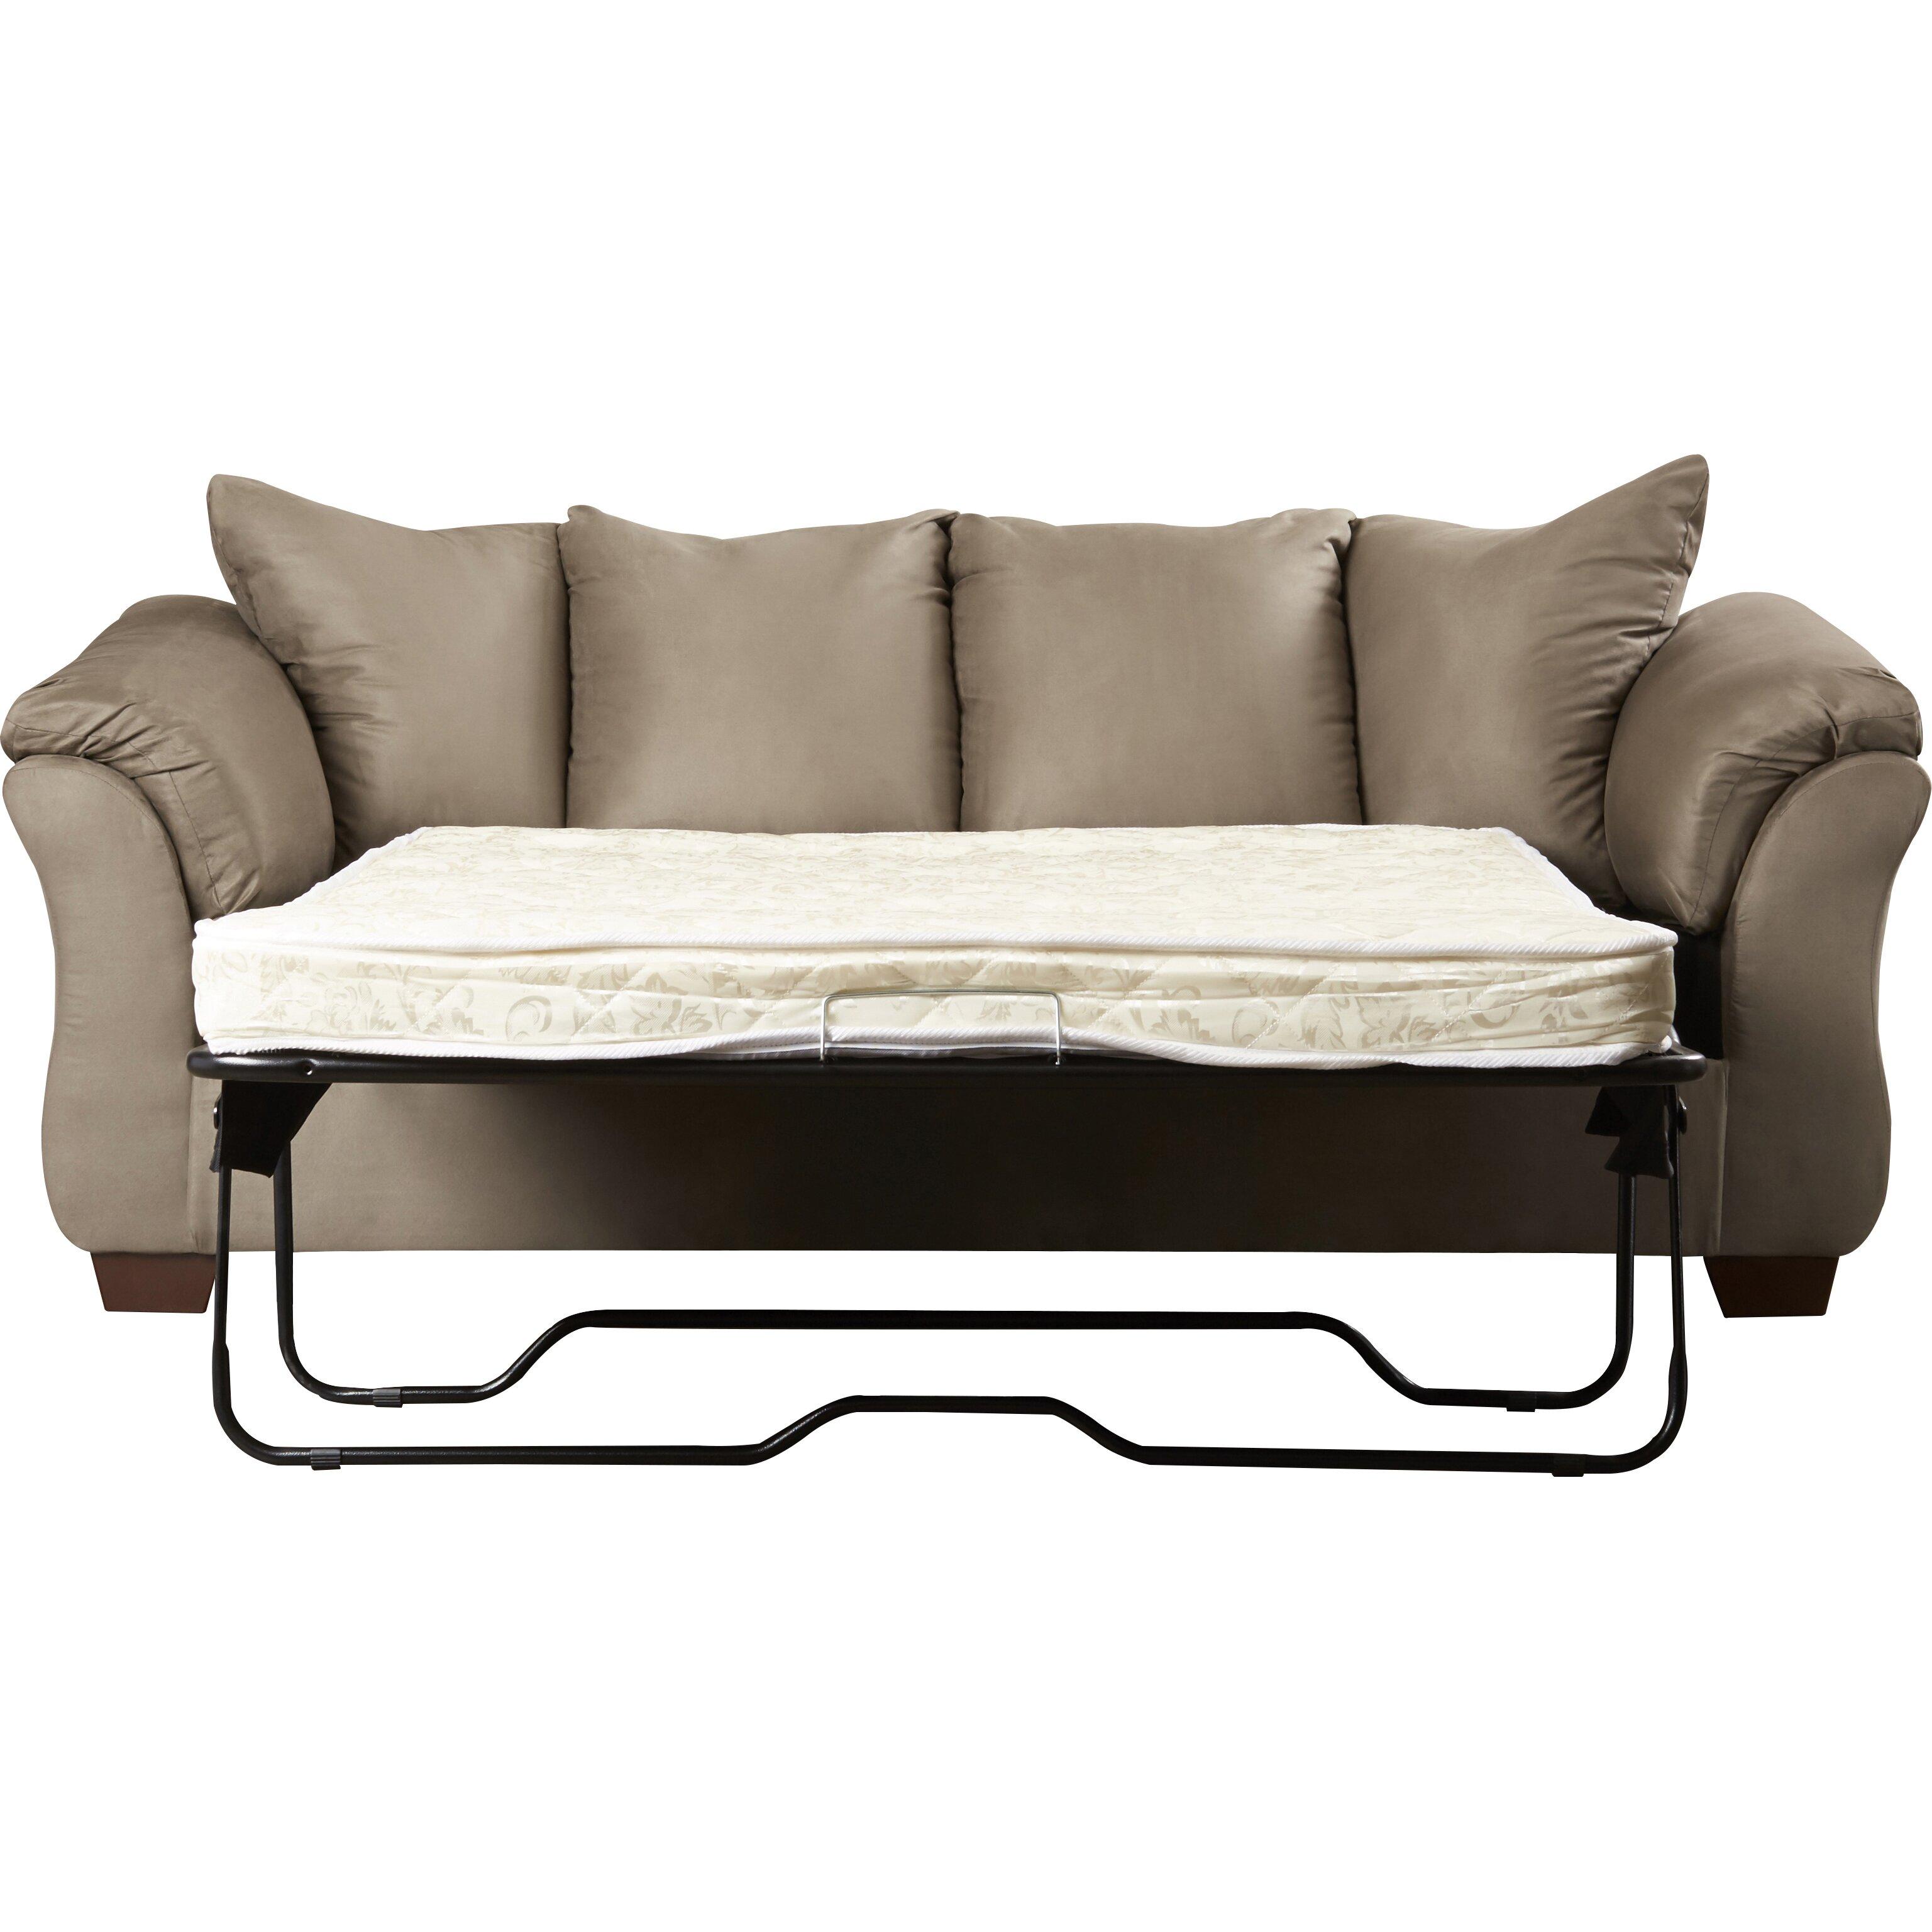 Cheap Sectional Sofas Huntsville Al Rs Gold Sofa  sc 1 st  Sofa Brownsvilleclaimhelp : sectional sofas huntsville al - Sectionals, Sofas & Couches